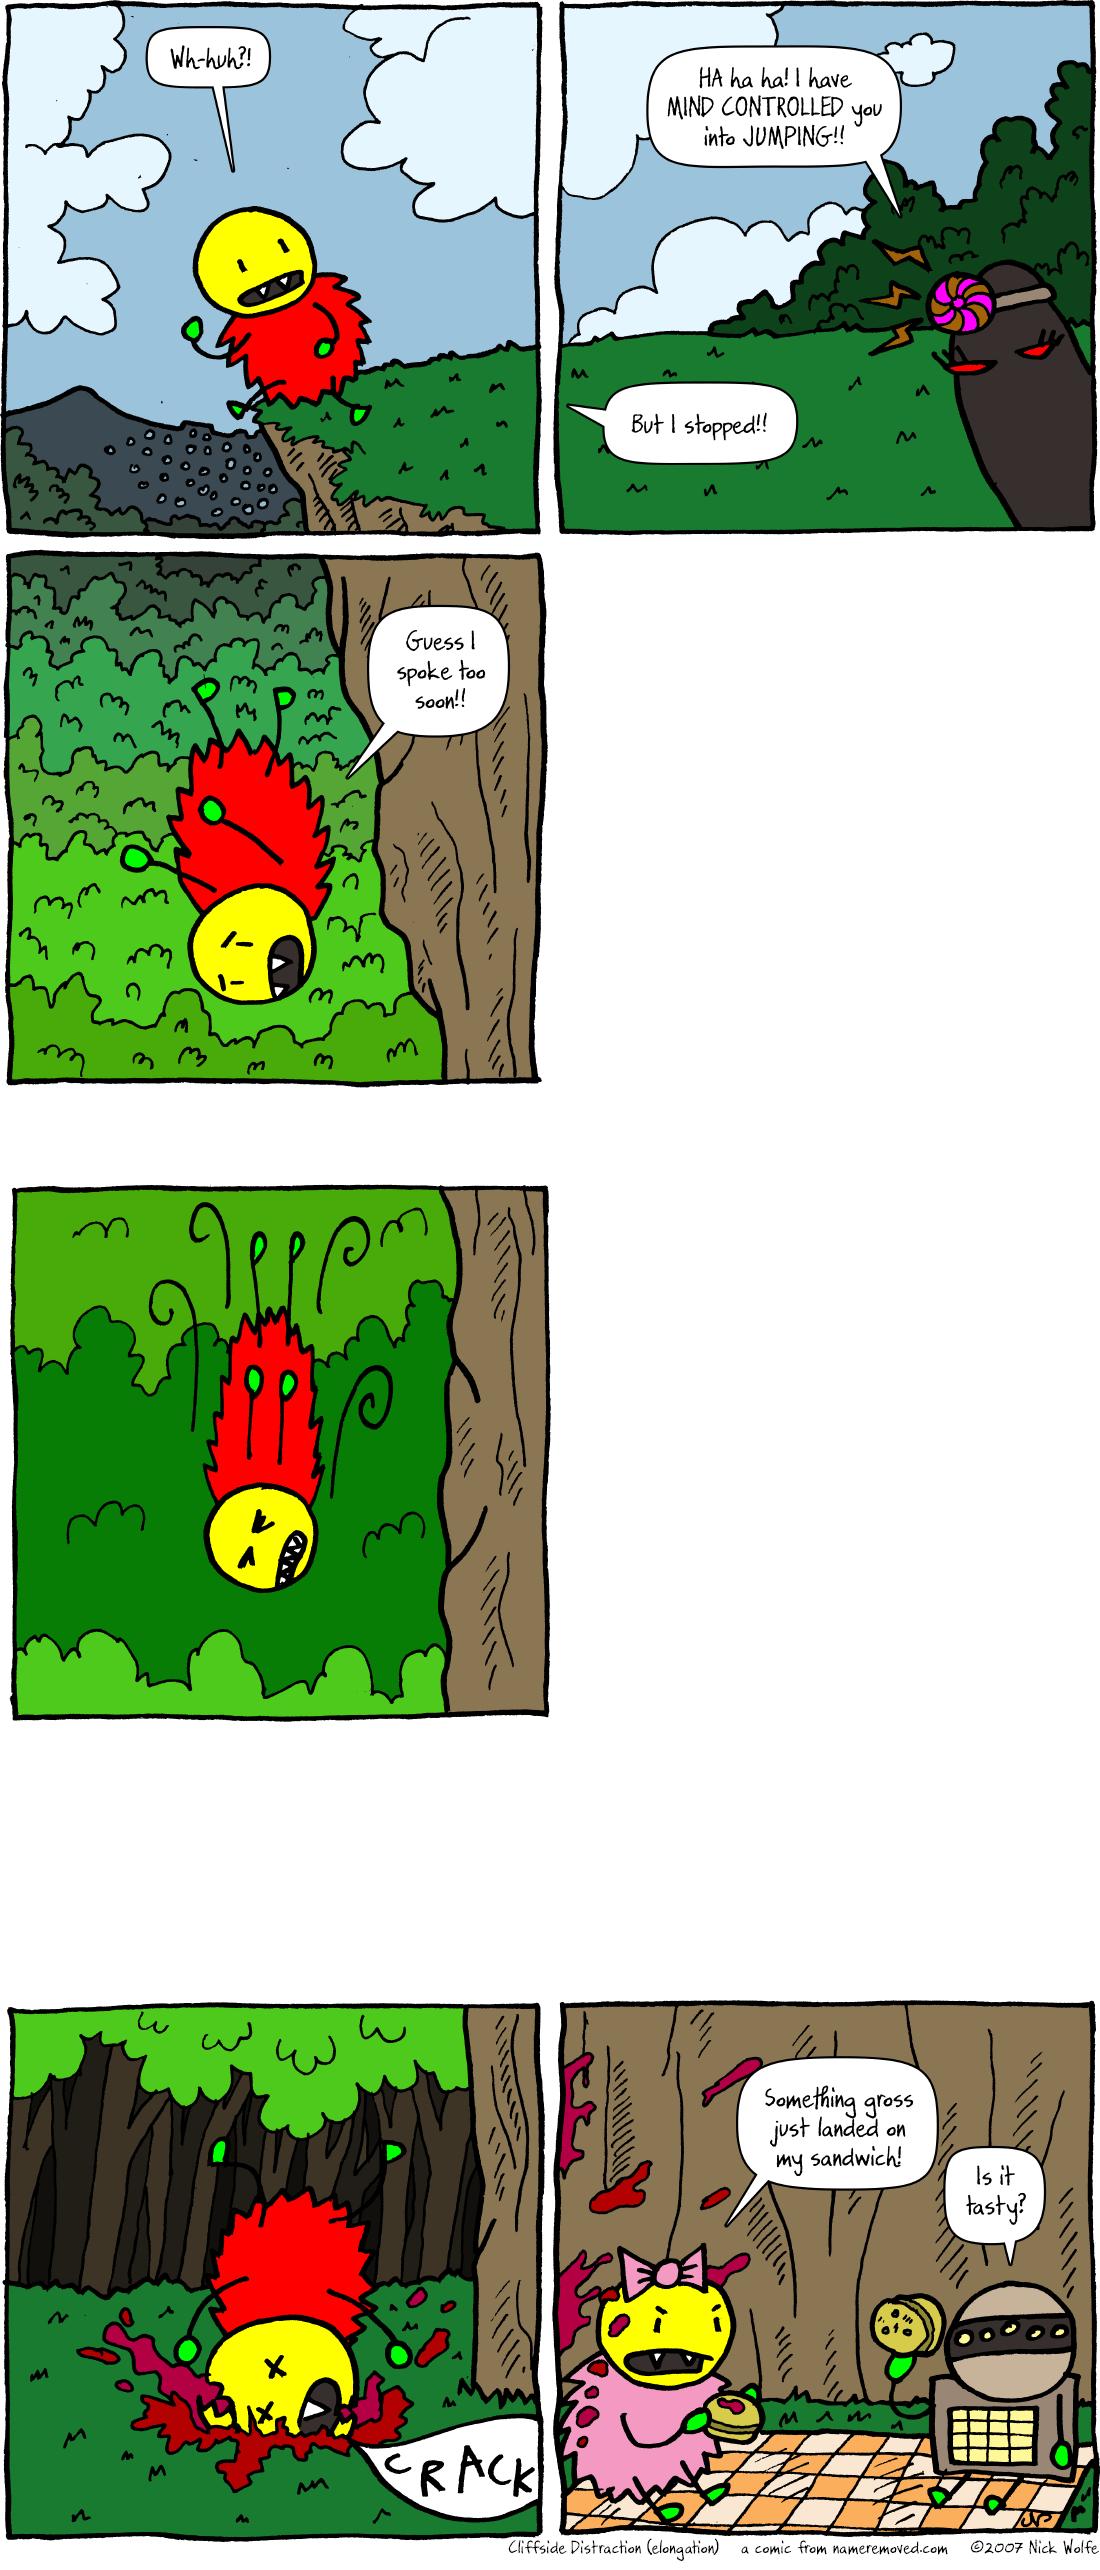 Cliffside Distraction (elongation)